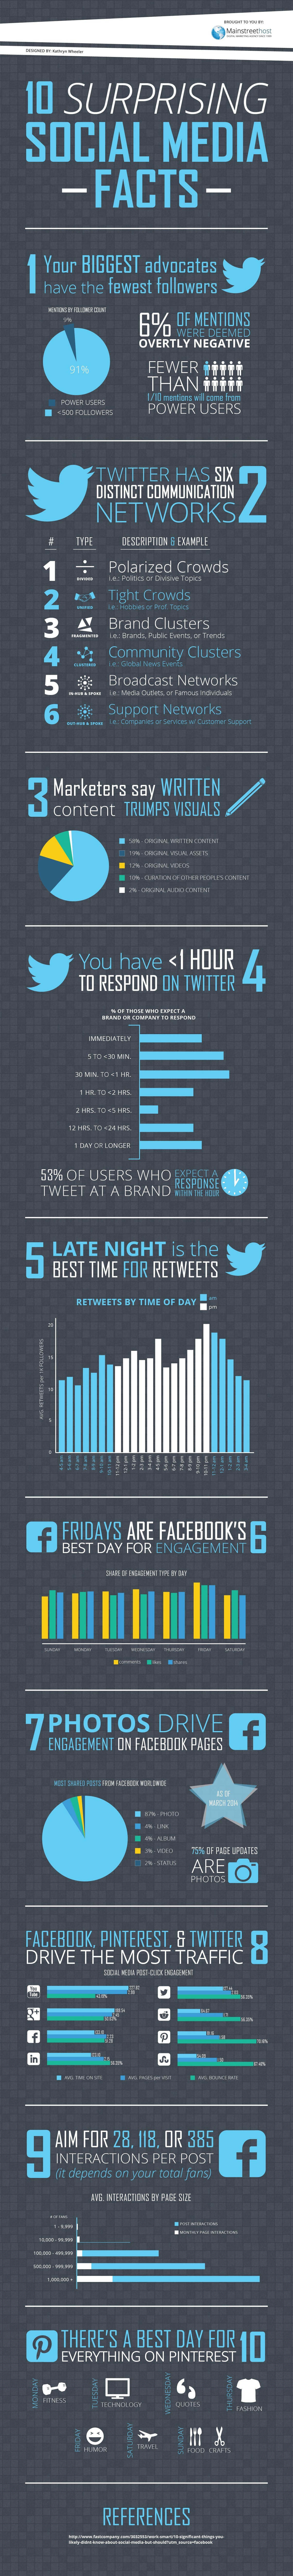 10 Crazy #SocialMedia Facts that Are ACTUALLY True